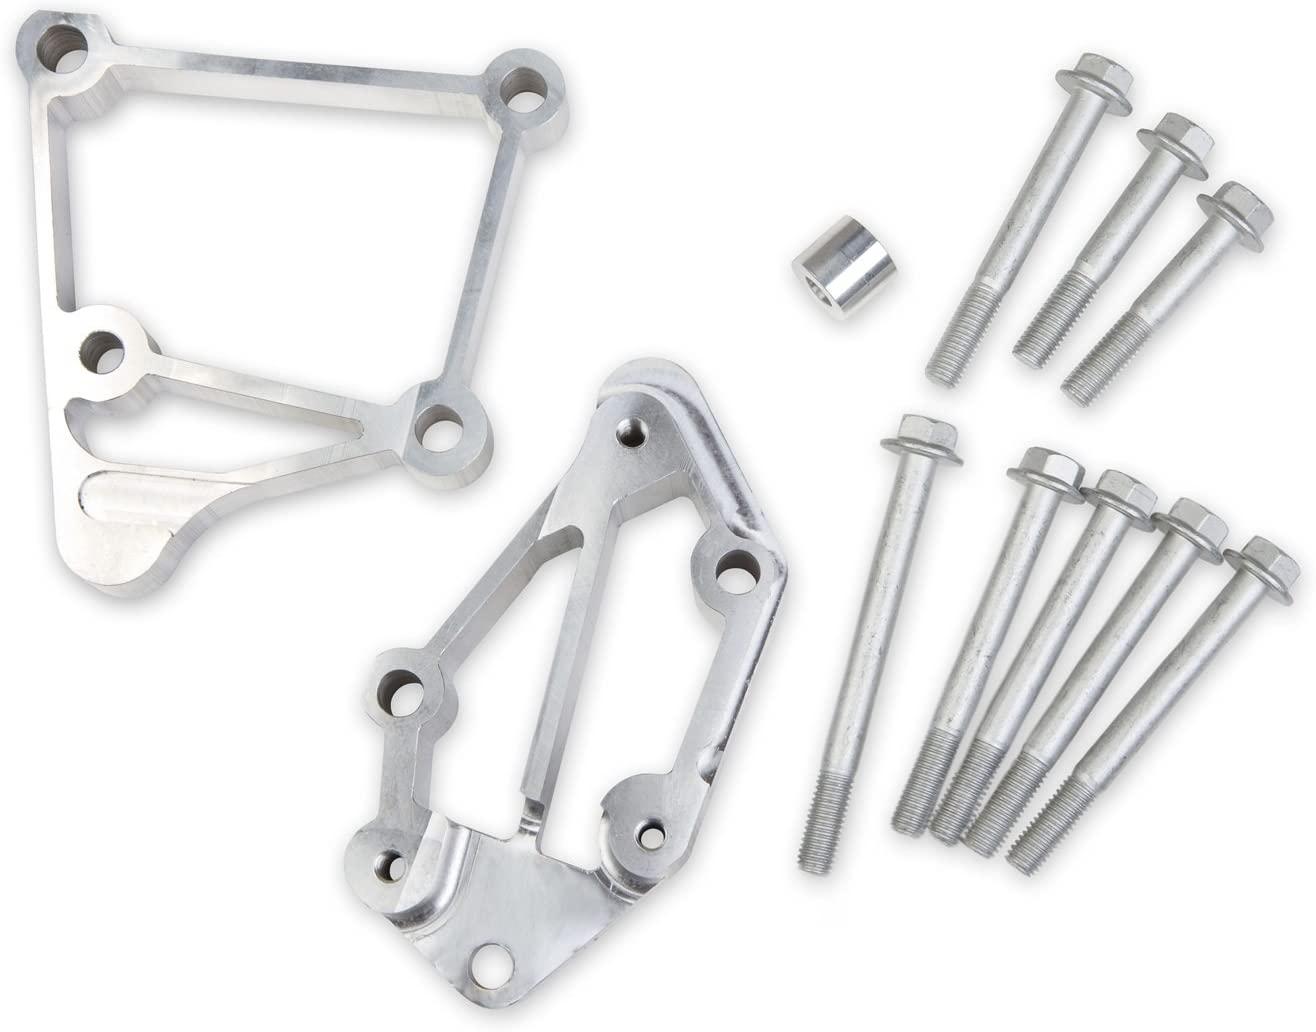 Holley 21-2 LS Accessory Drive Bracket Kit